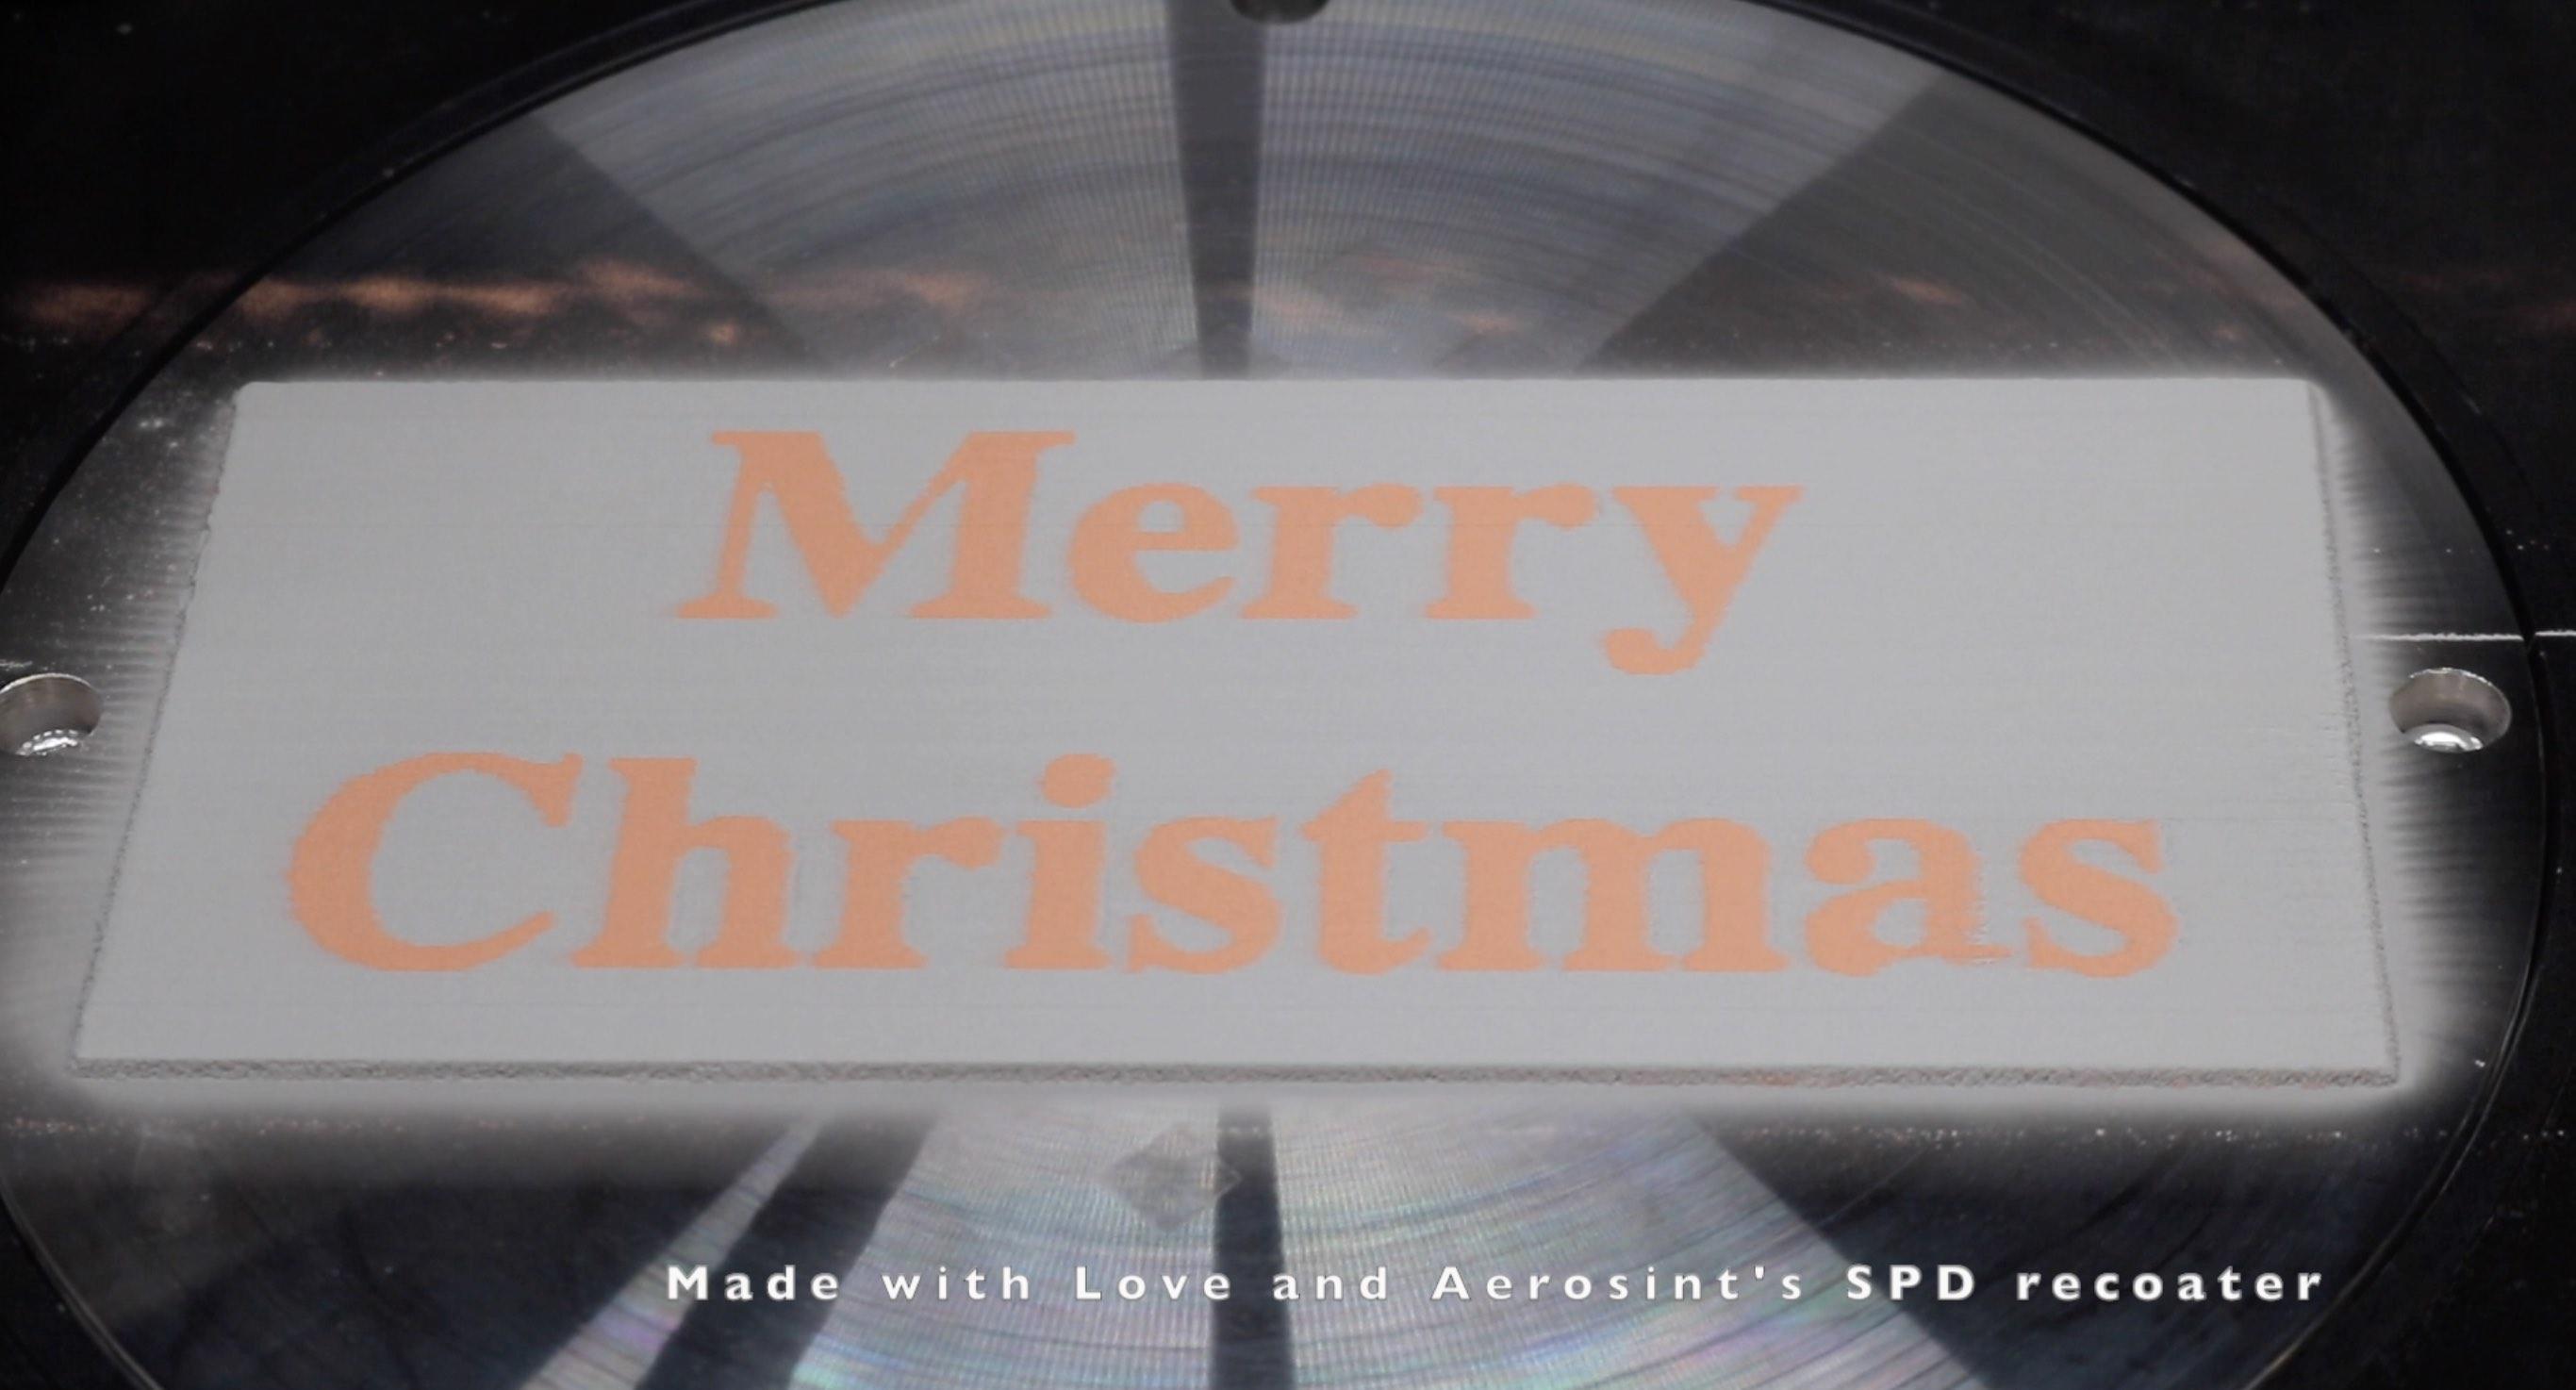 Merry Christmas from Aerosint